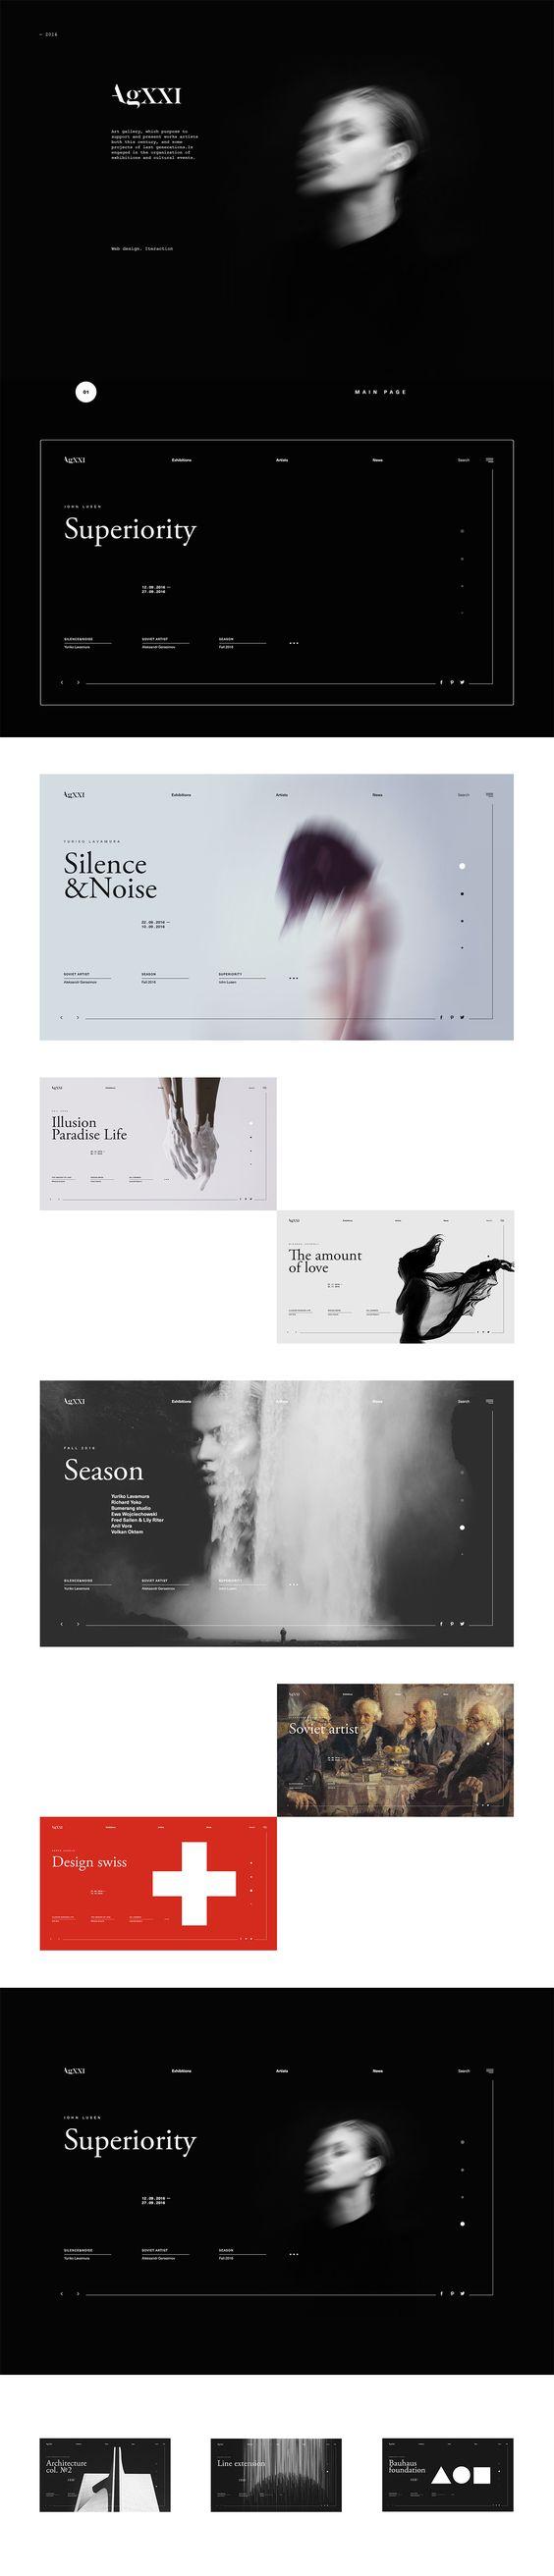 AgXXI | Website